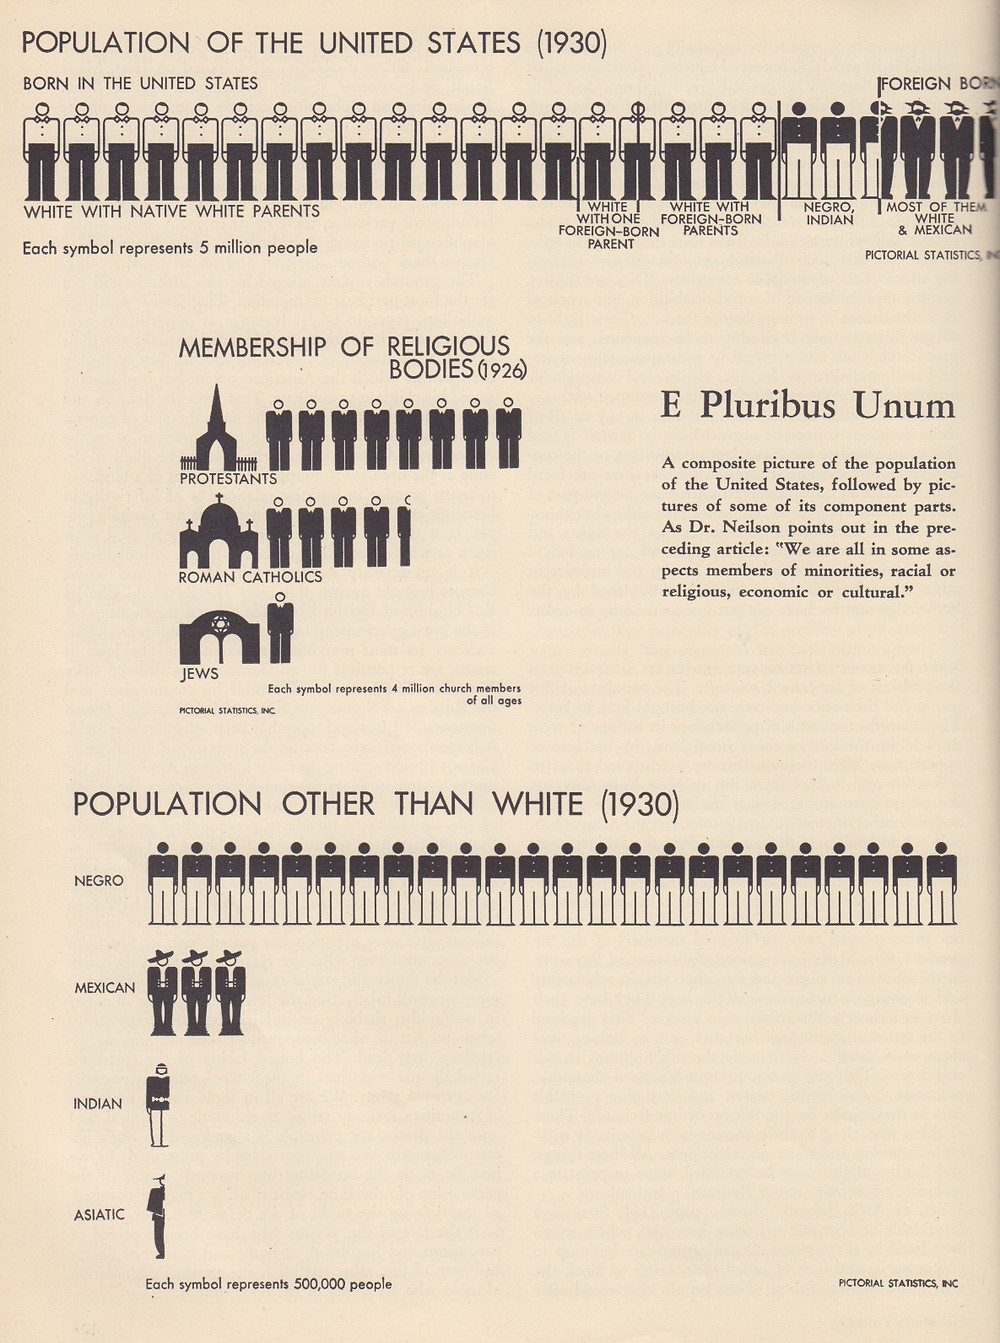 population of the U.S